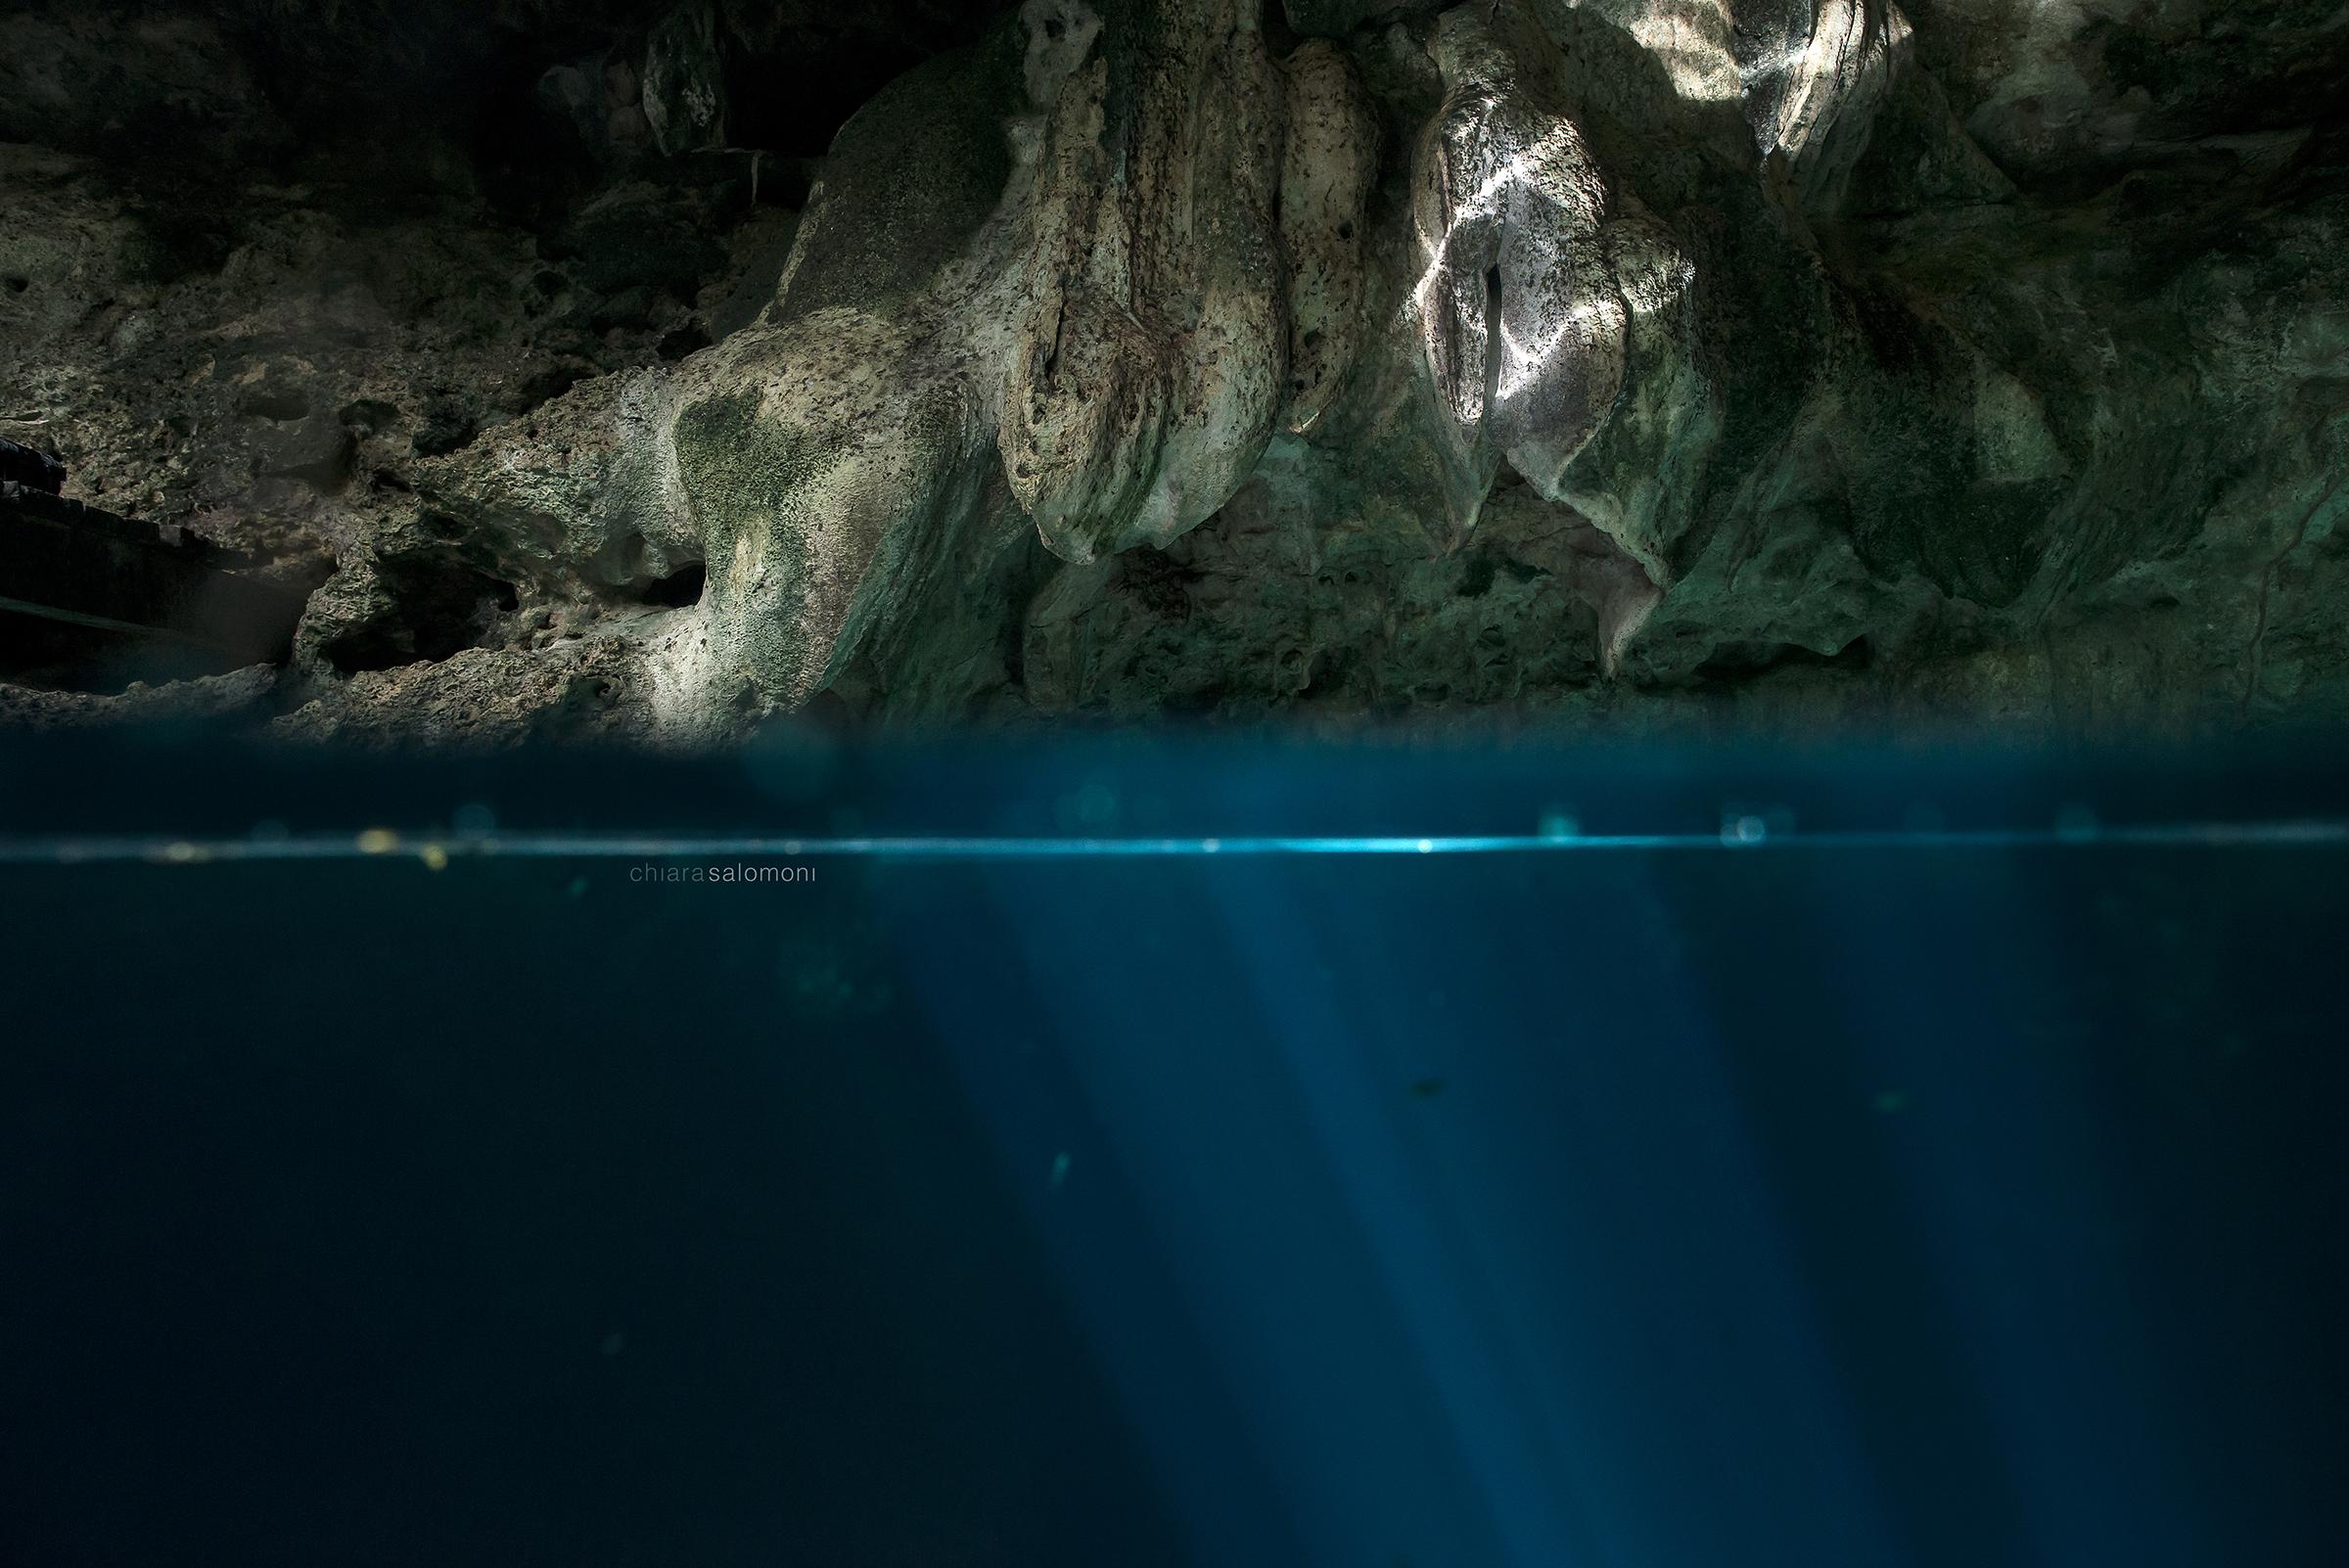 cenotes-portfolio-4